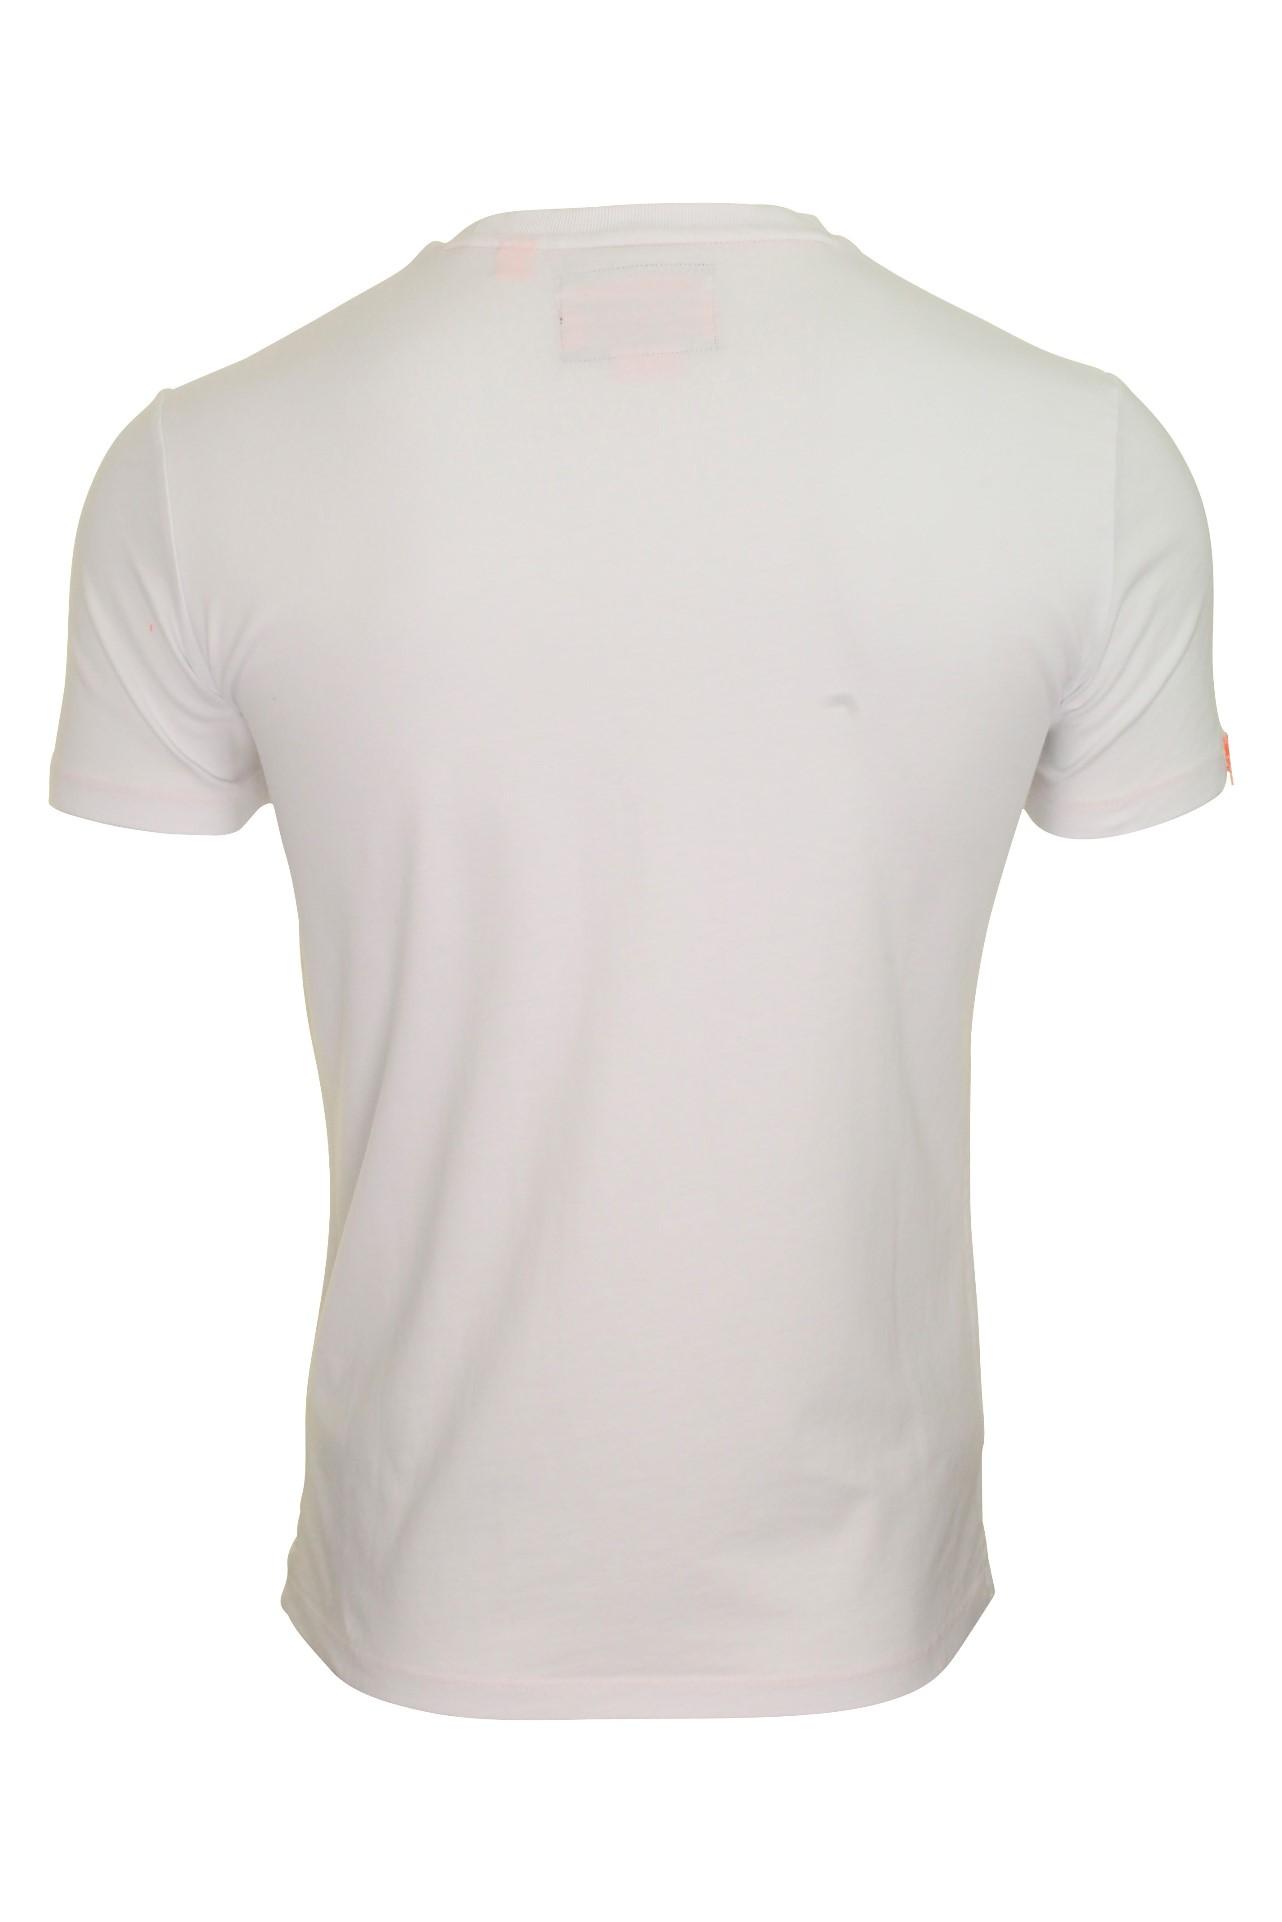 Top-Superdry-Orange-Label-Da-Uomo-039-Vintage-039-T-shirt-girocollo miniatura 14